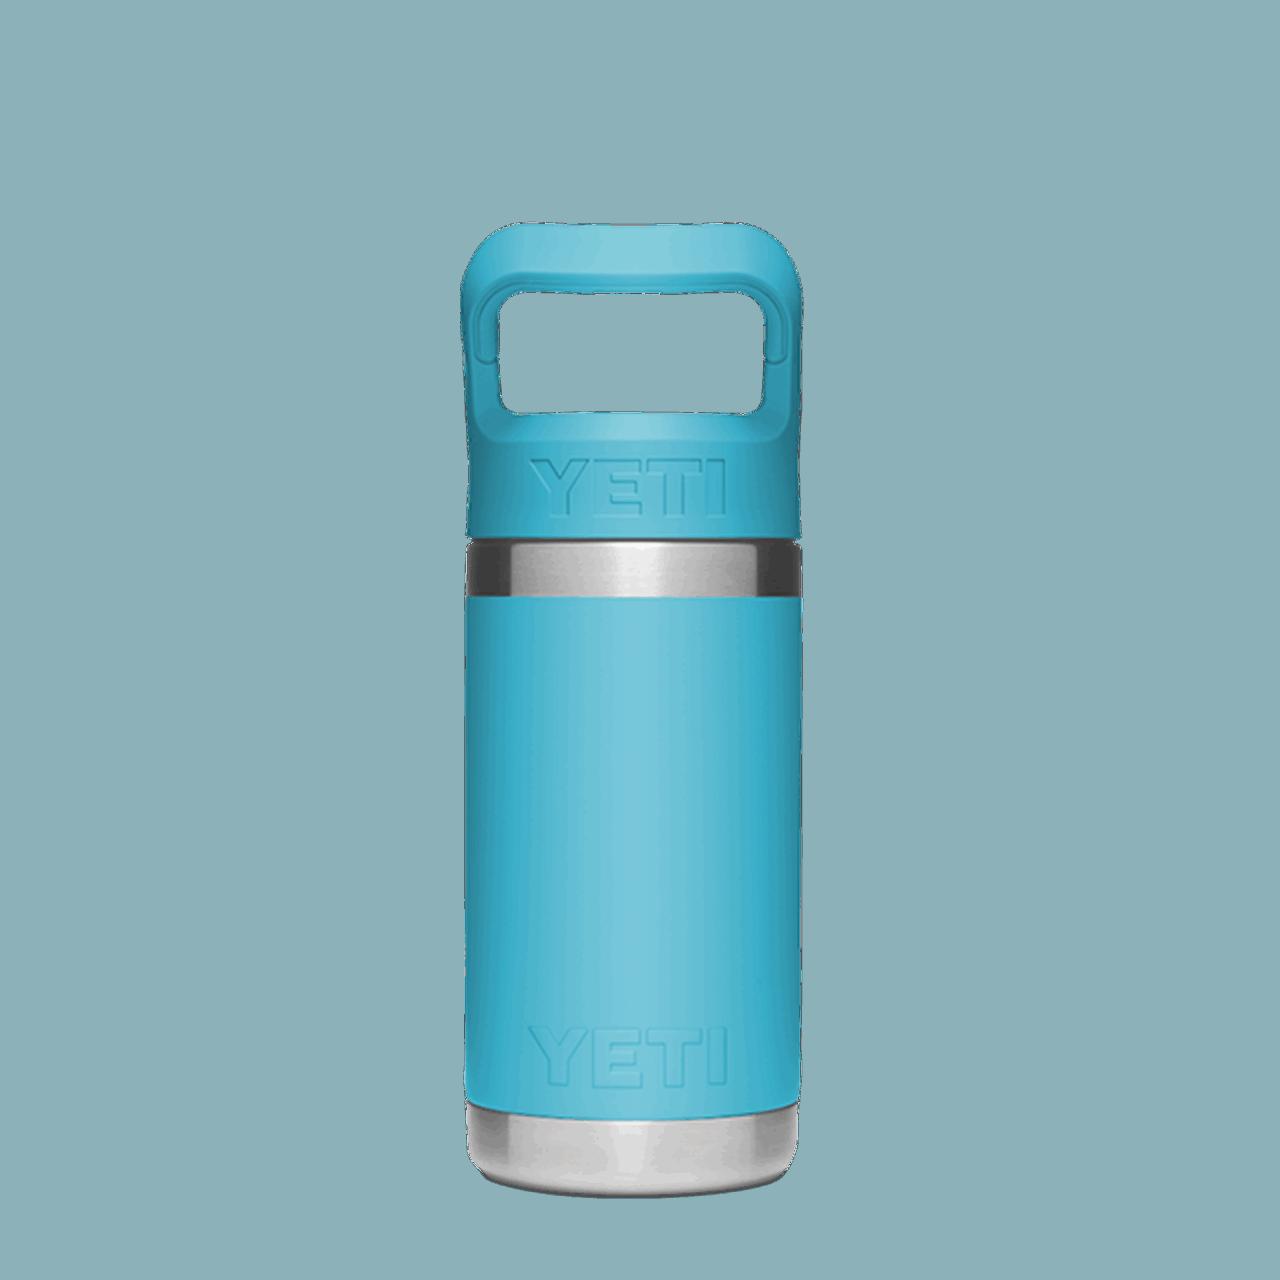 YETI Rambler Jr. 12oz Kids Bottle - reef blue